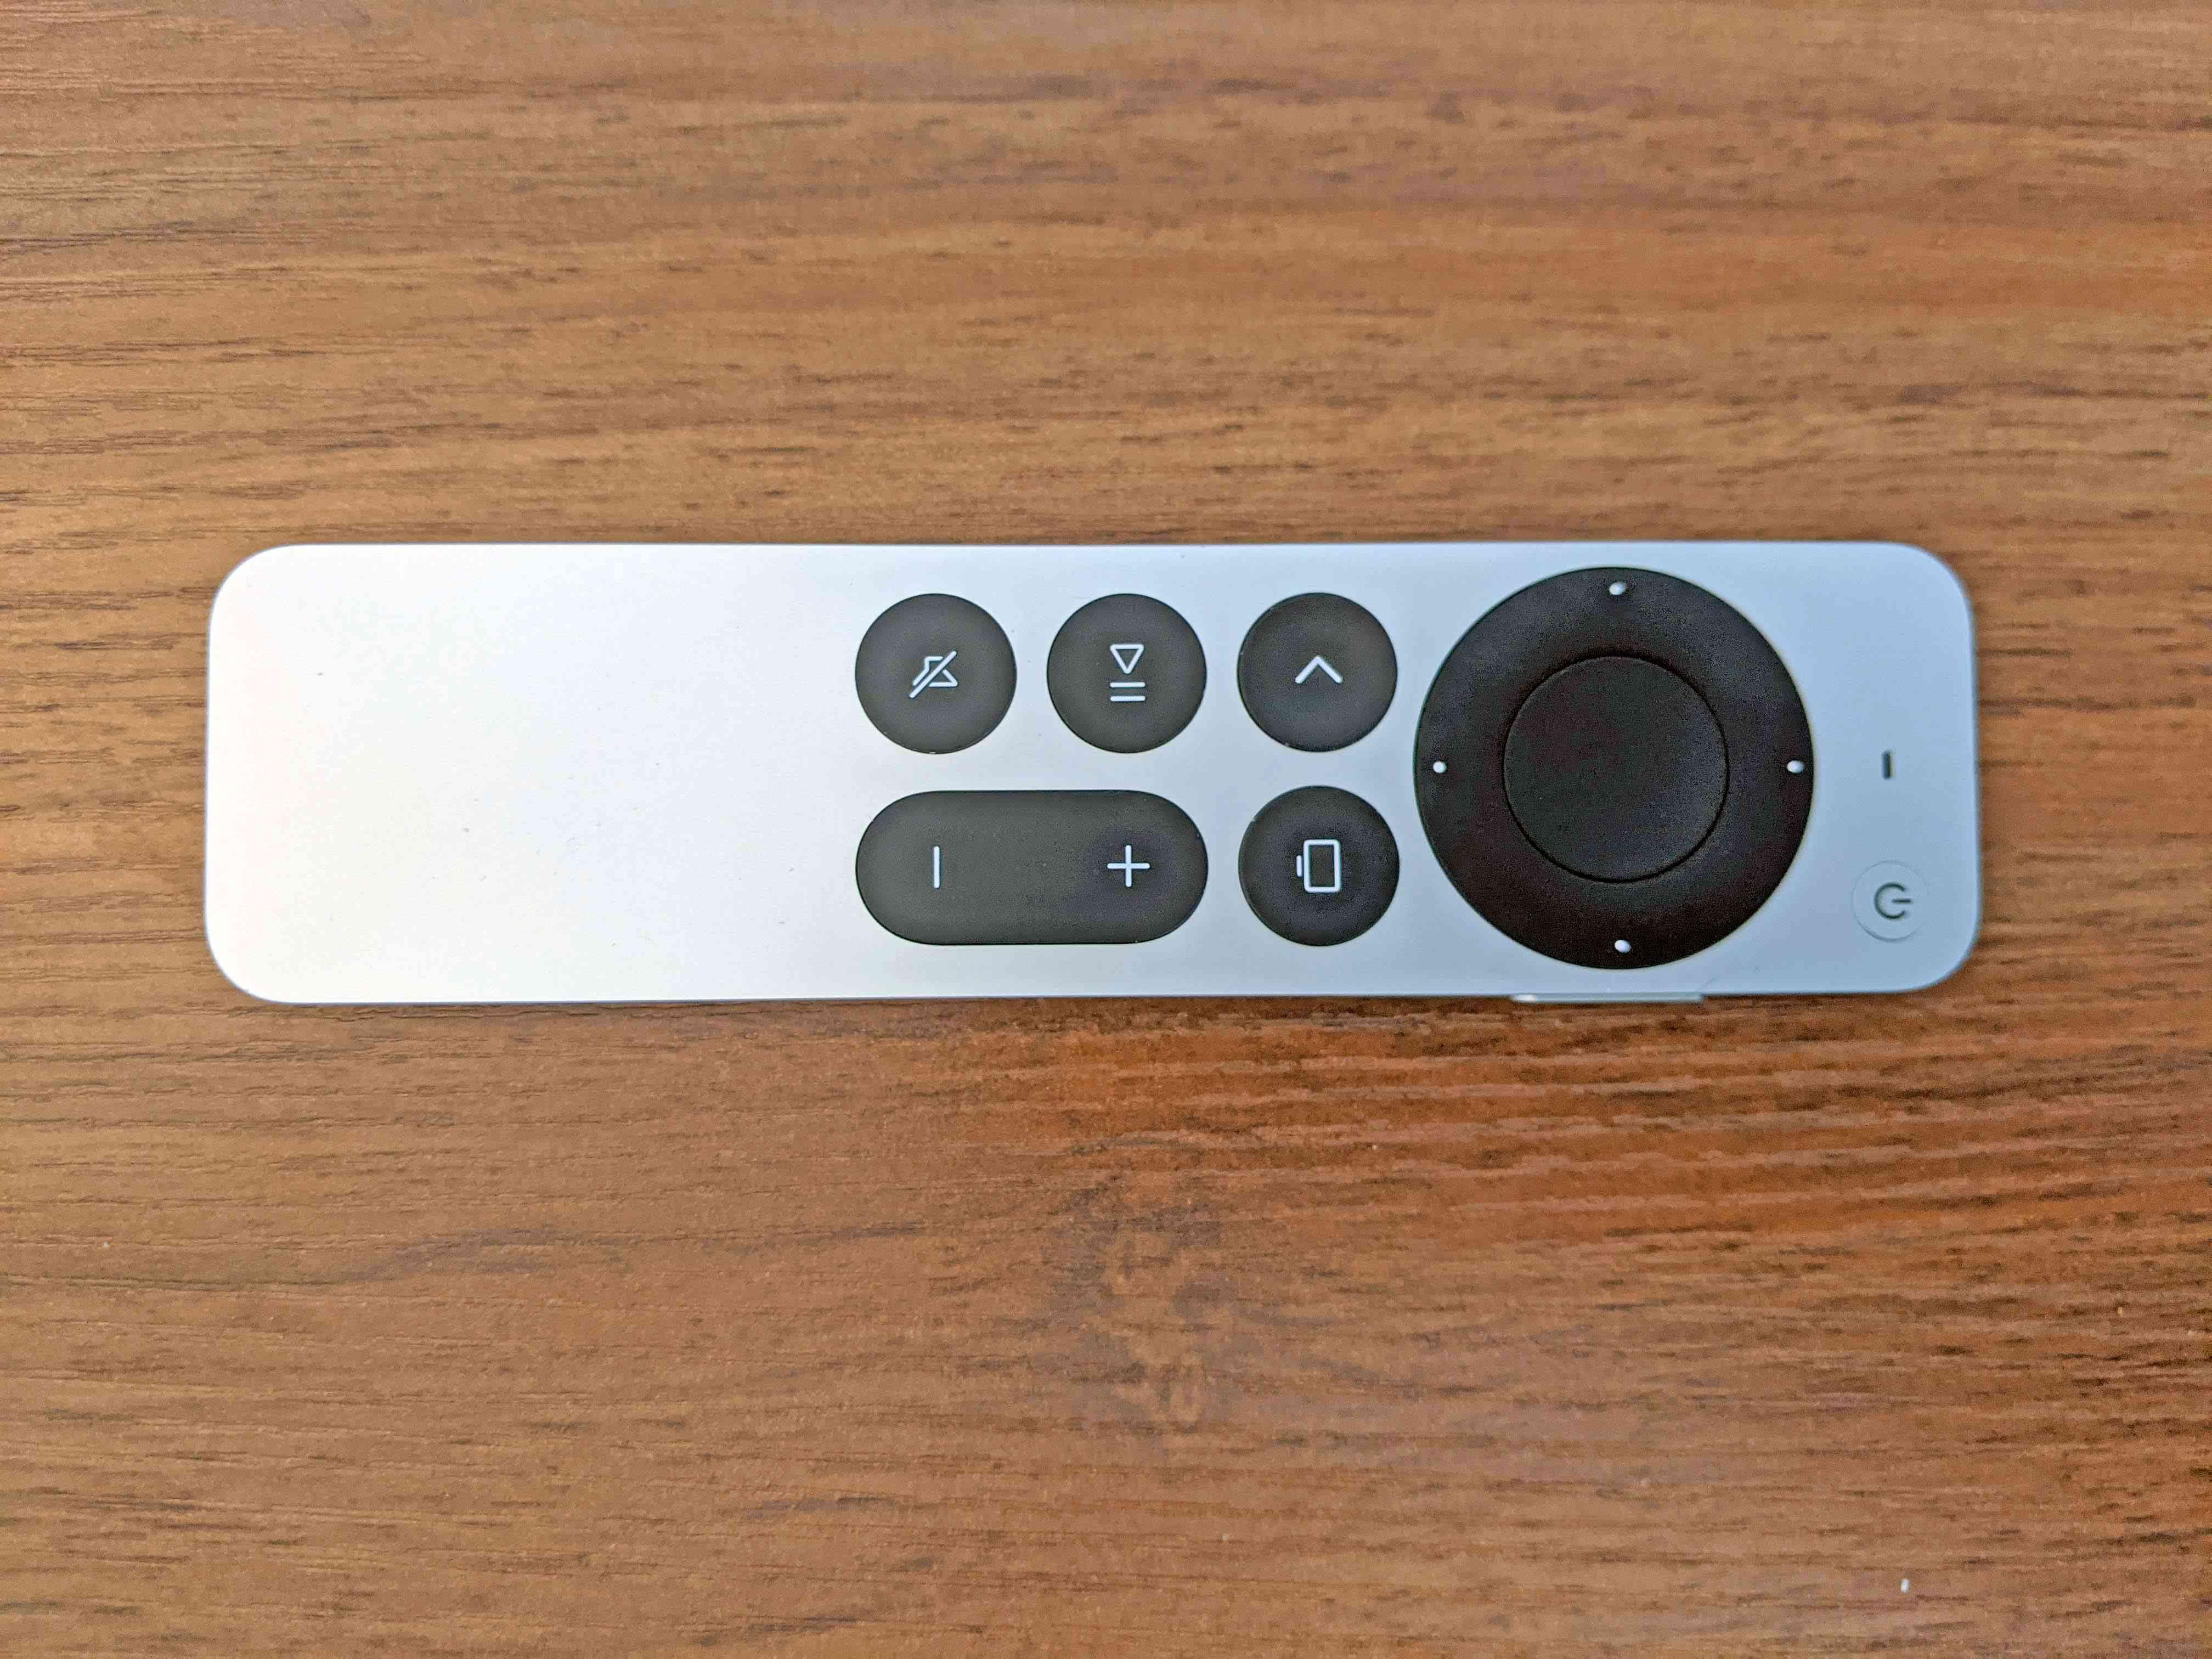 The Apple TV 4K Siri remote.